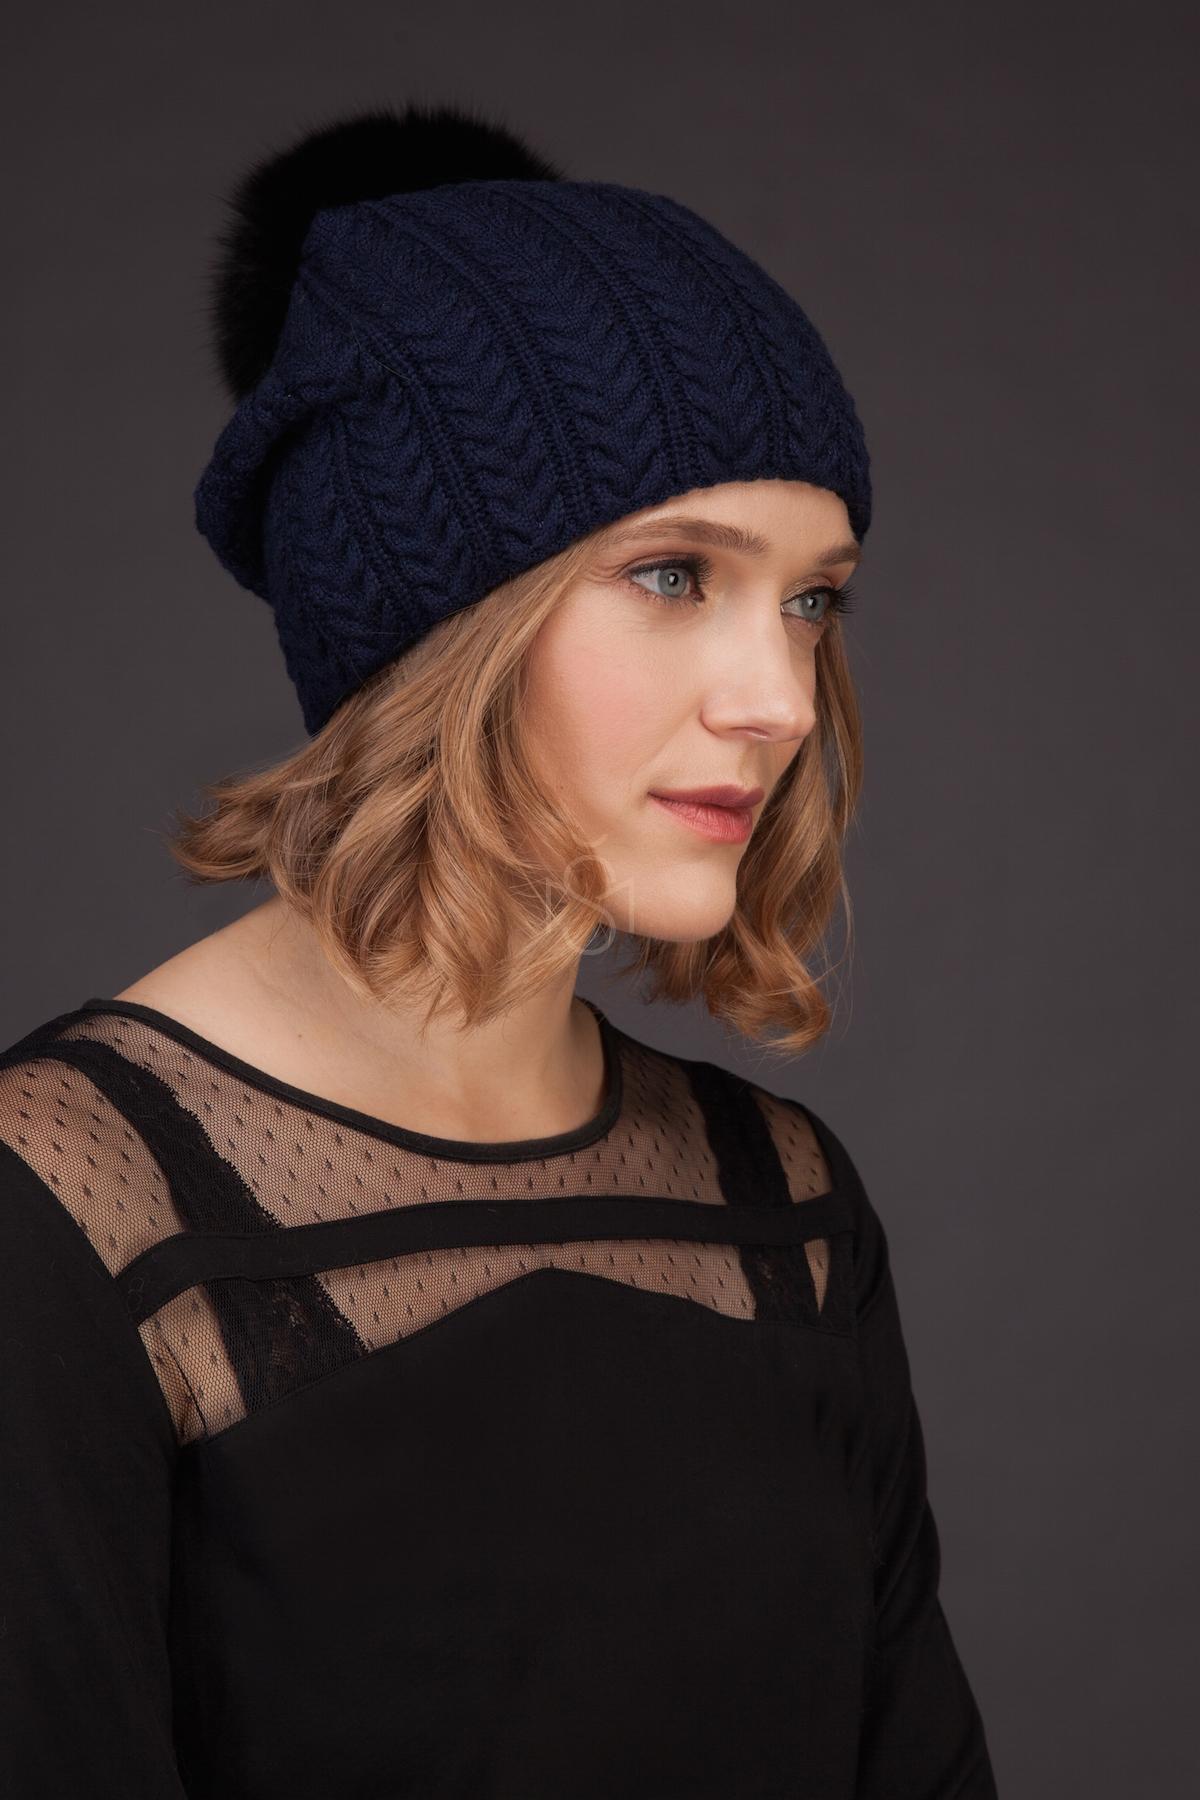 Cashmere hat with fox fur pom_pom_blue made by SILTA MADA fur studio in Vilnius